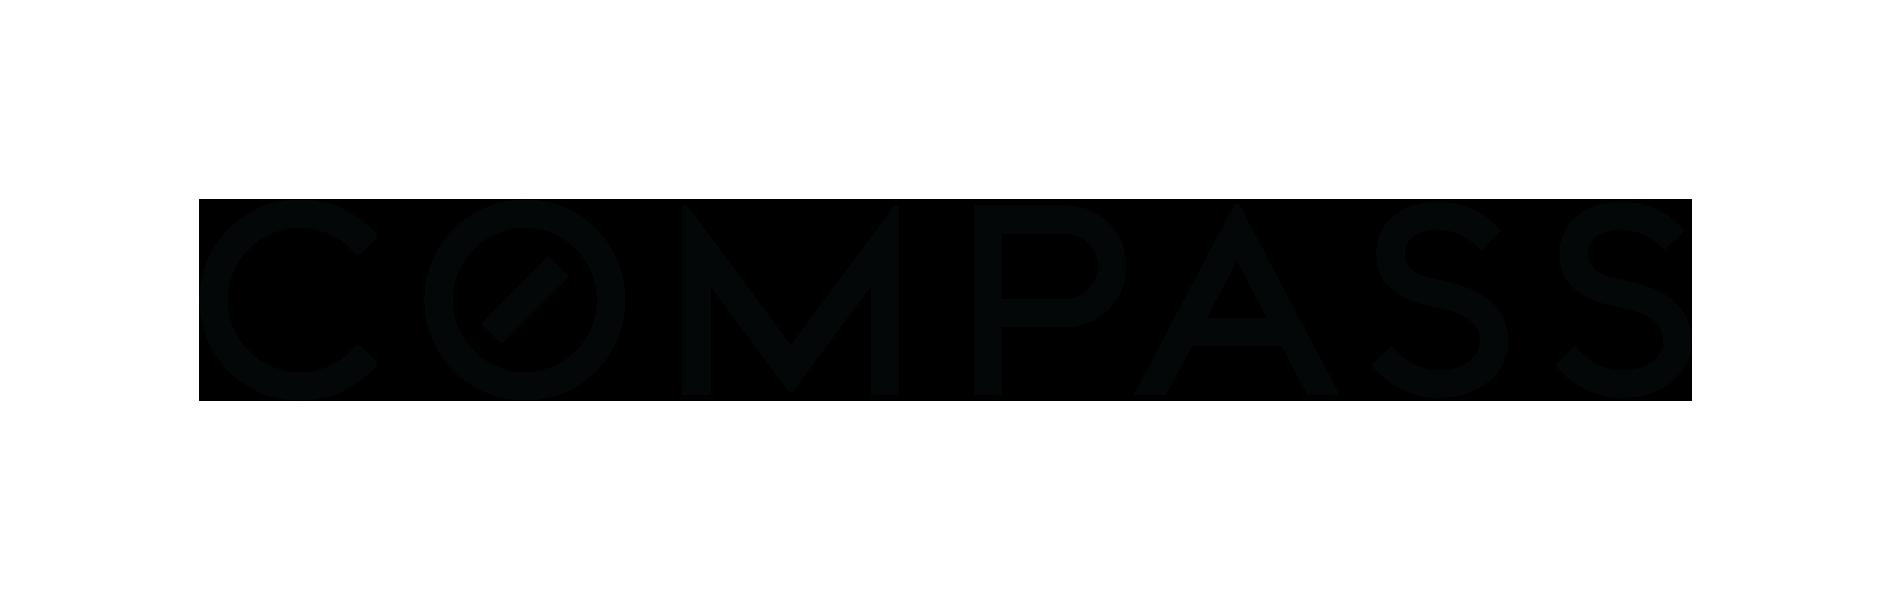 compass_logo_black_transparent (1) (2).png